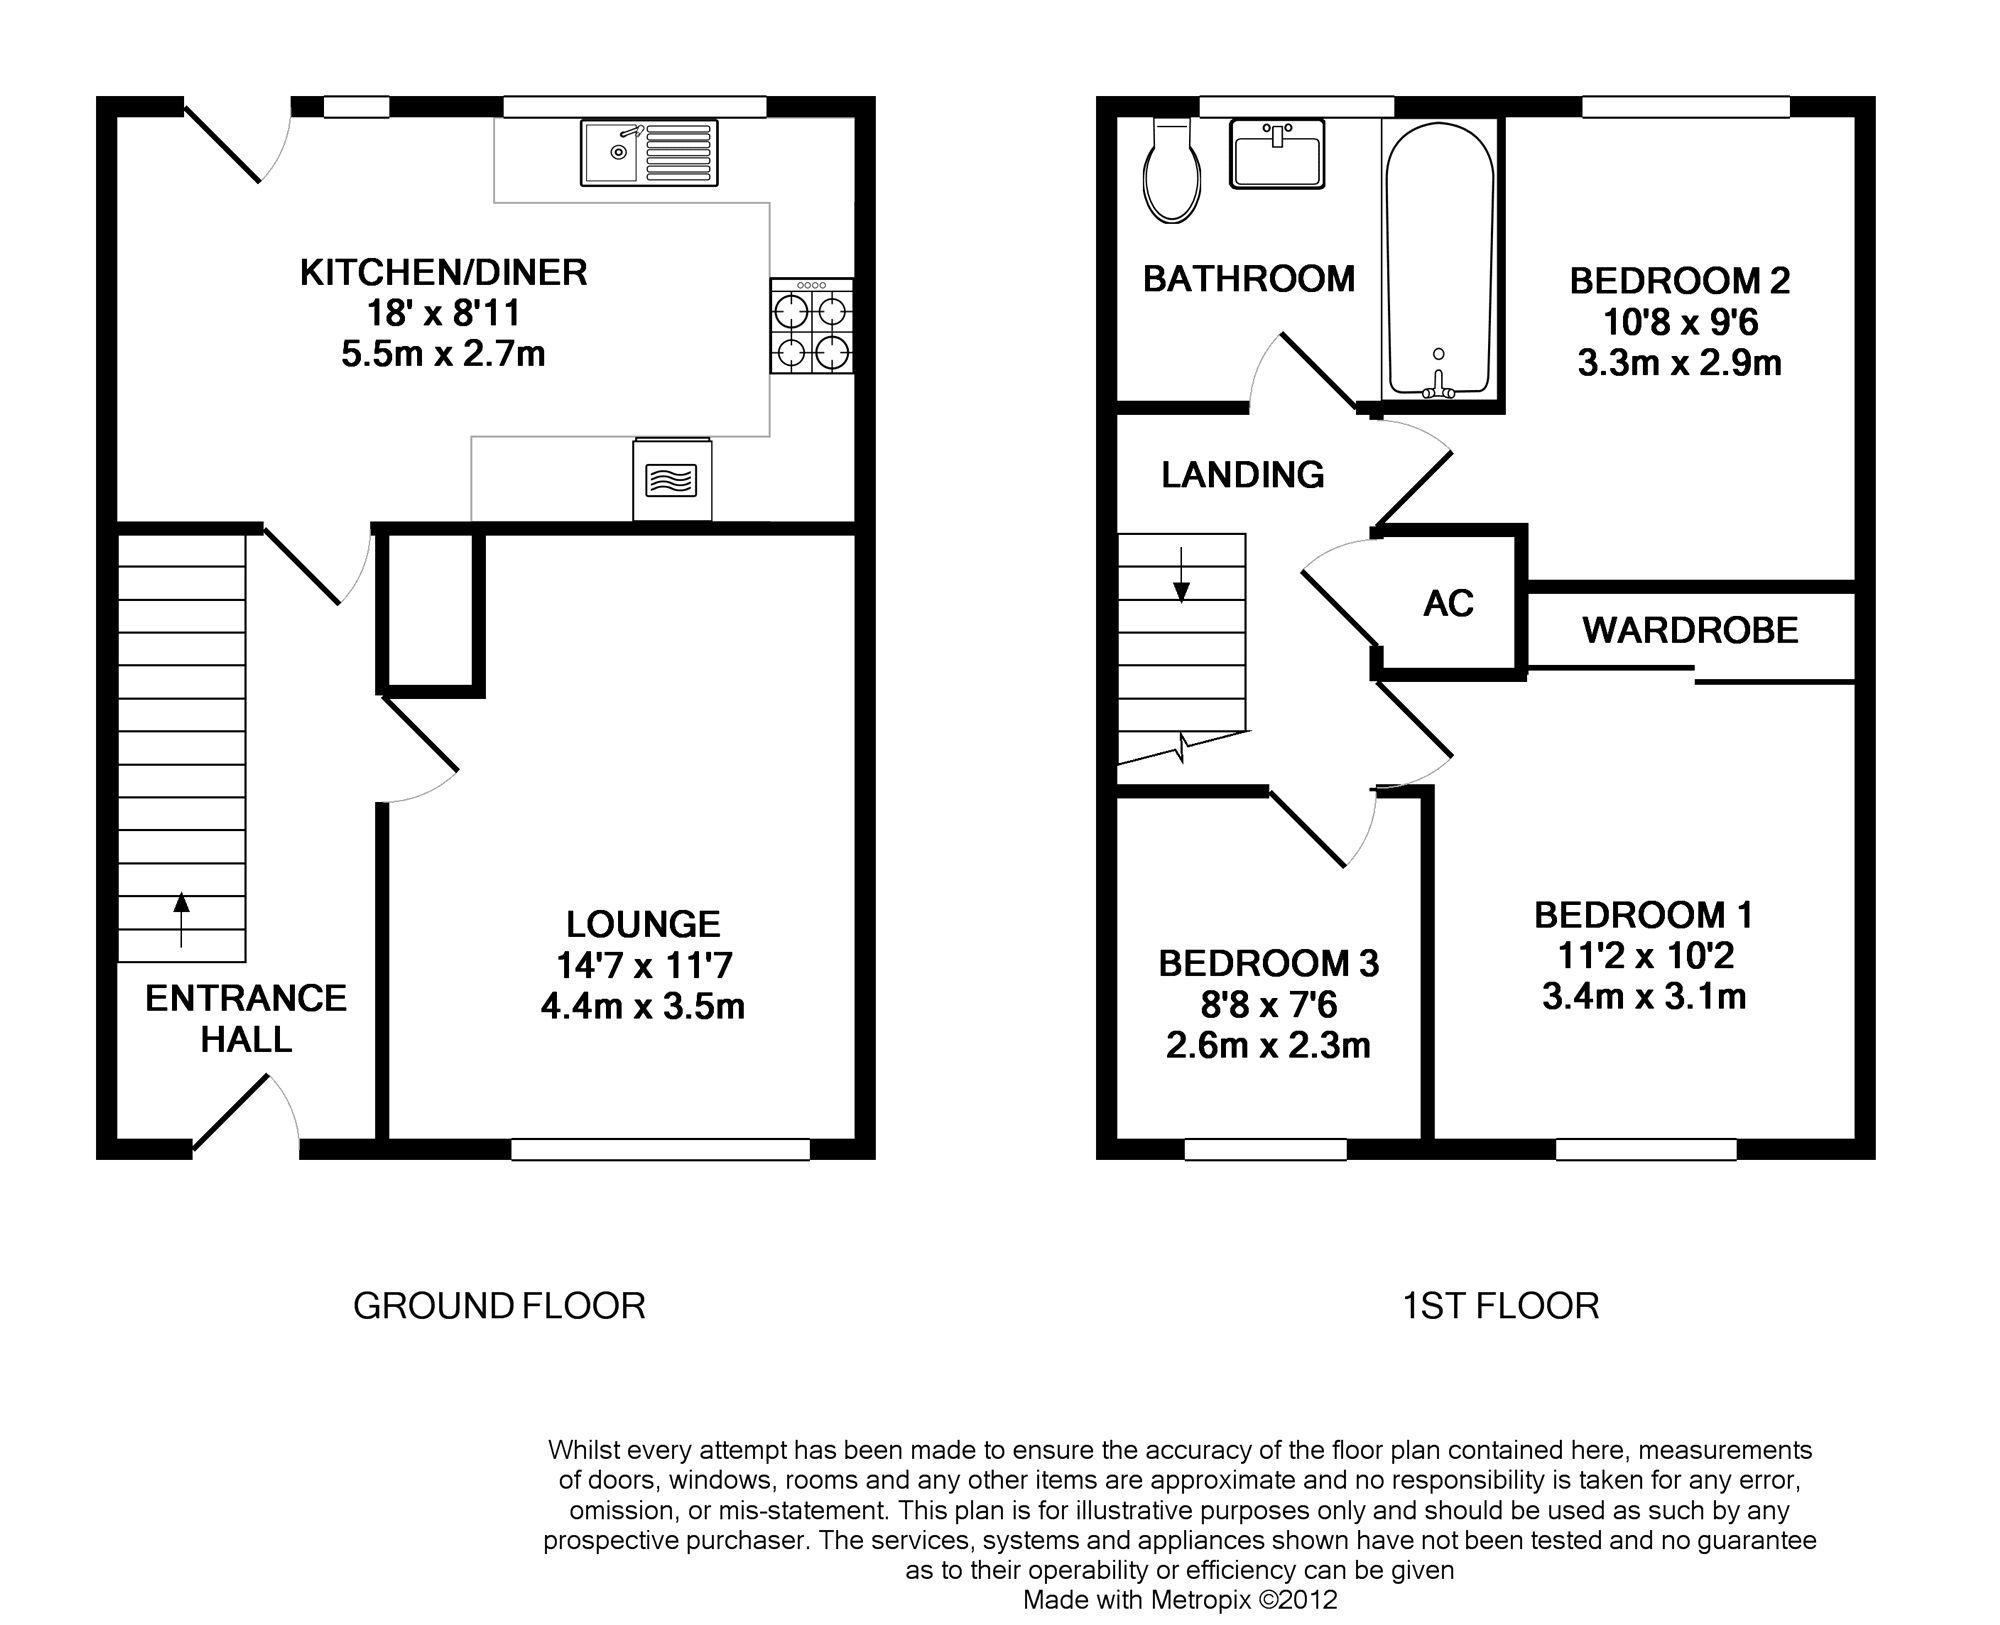 Floorplan for Brockworth, Yate.